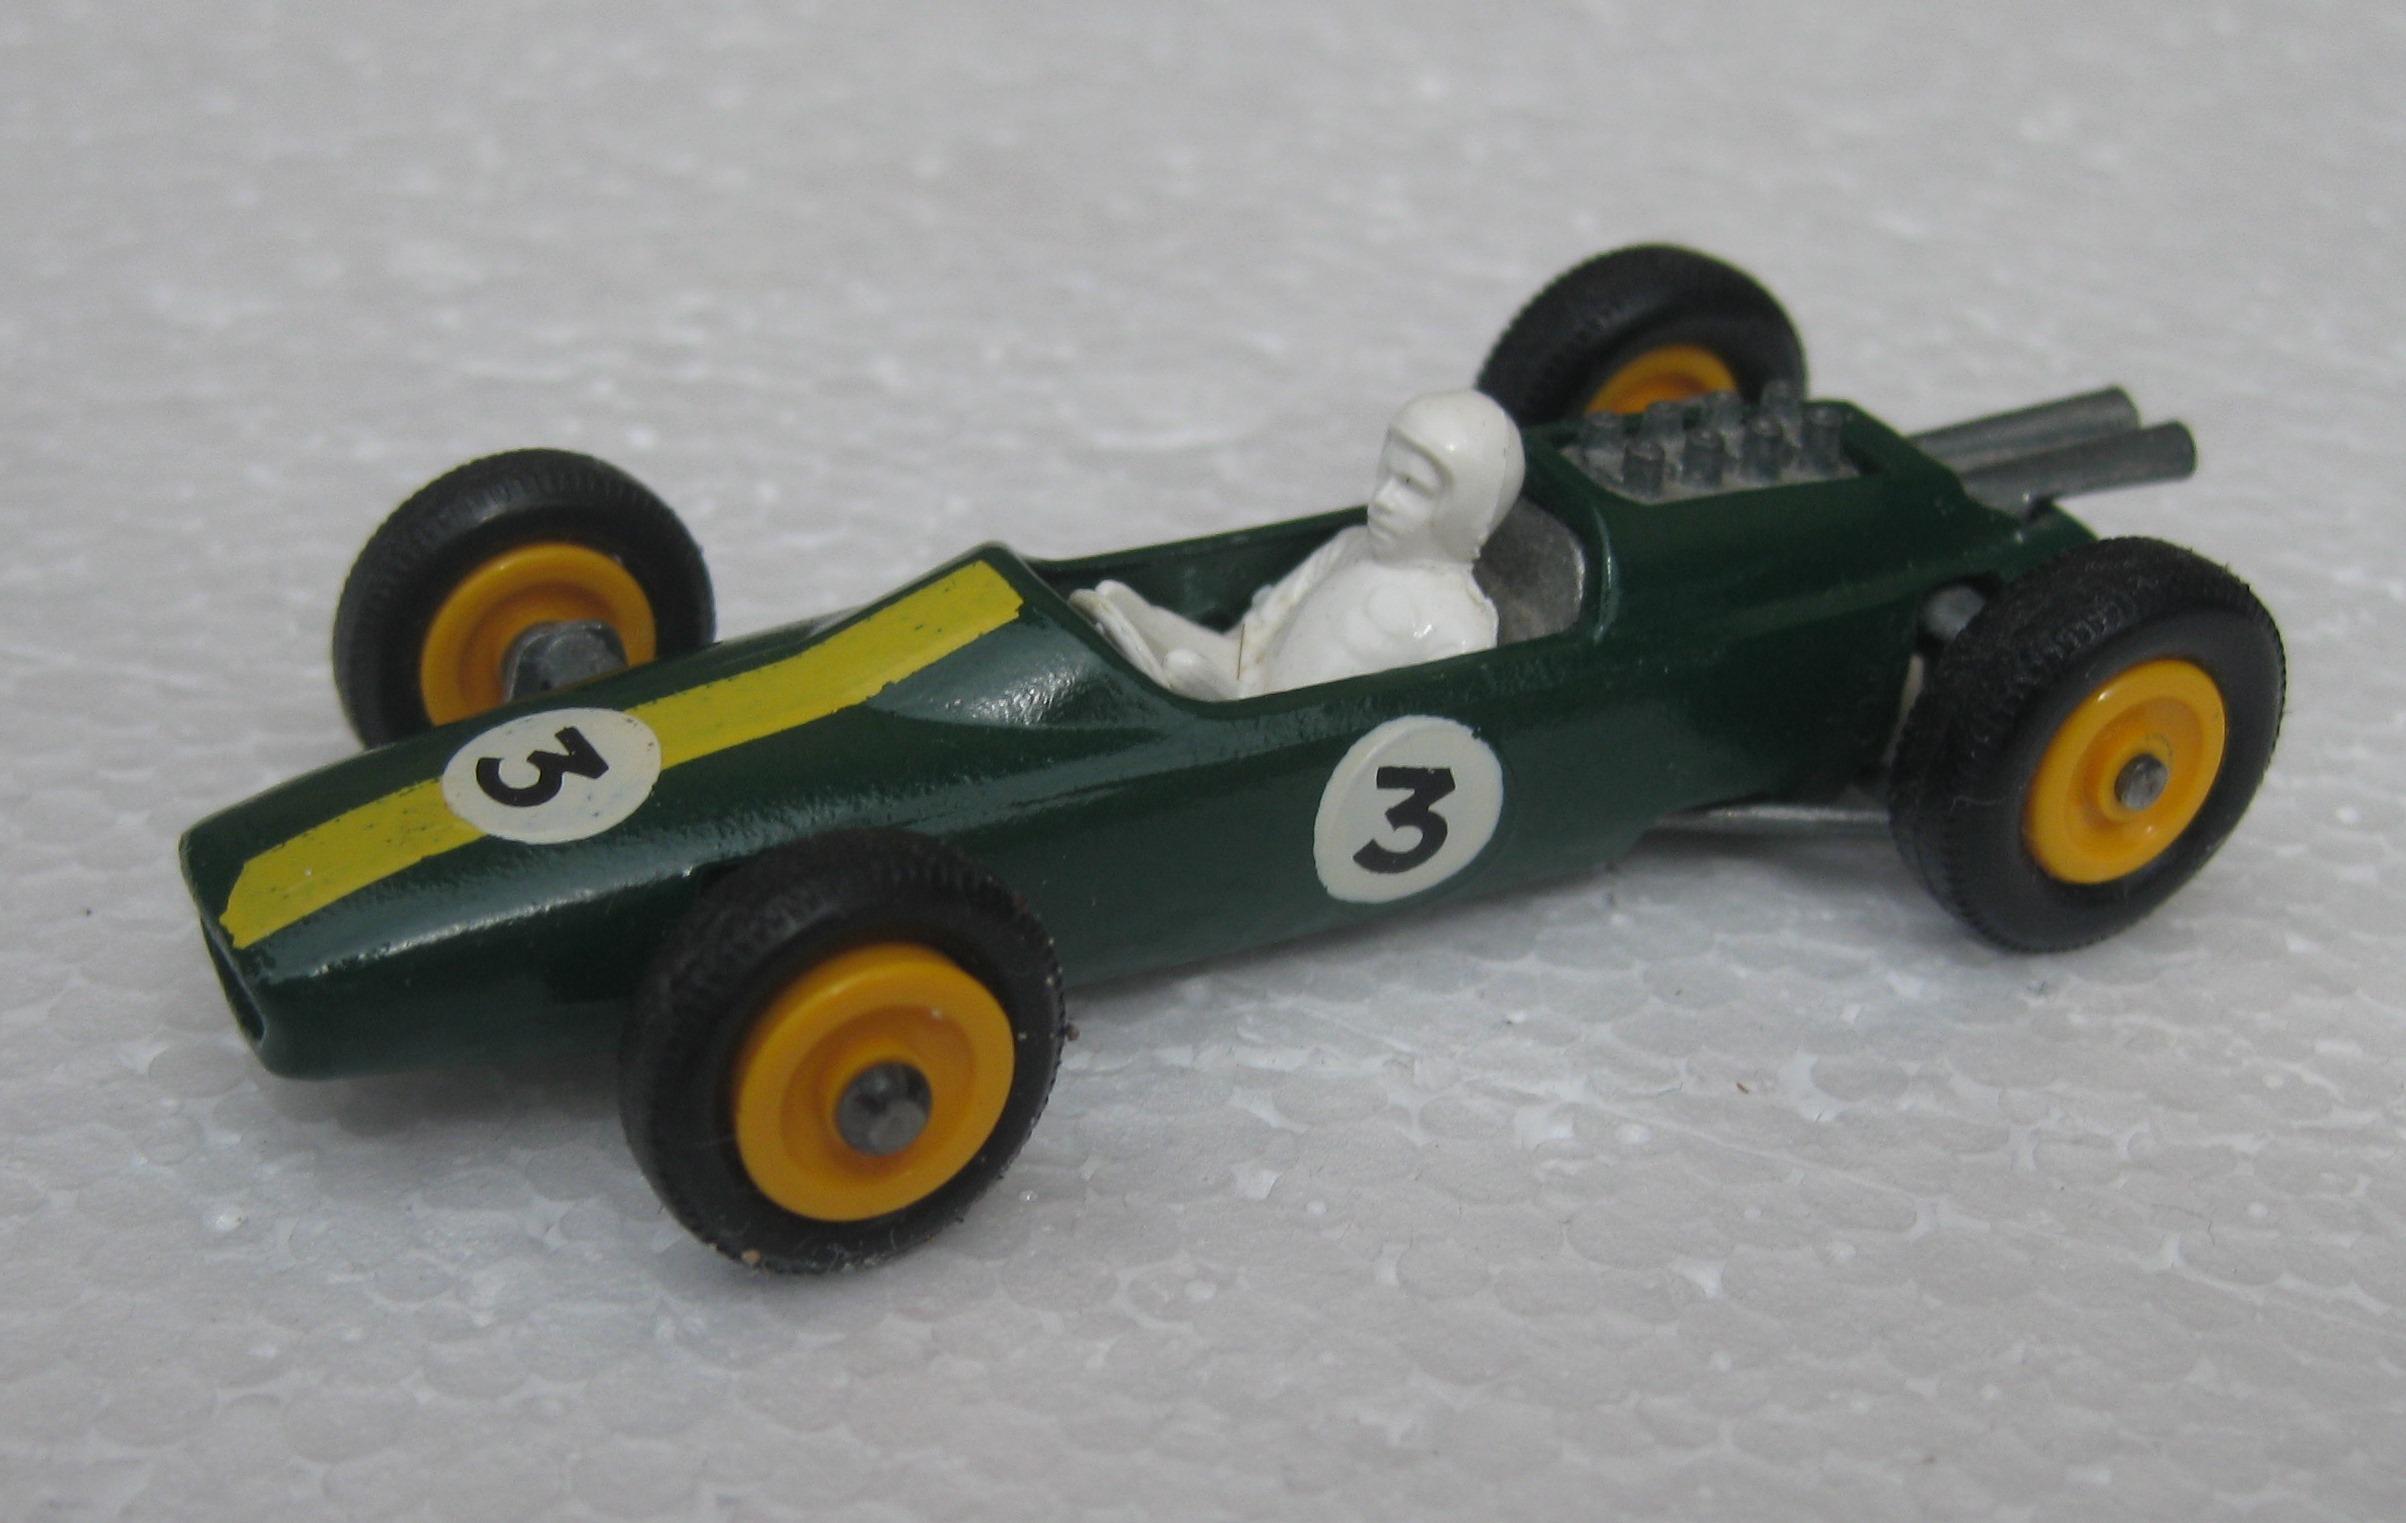 Lotus Racing Car | Matchbox Cars Wiki | FANDOM powered by Wikia